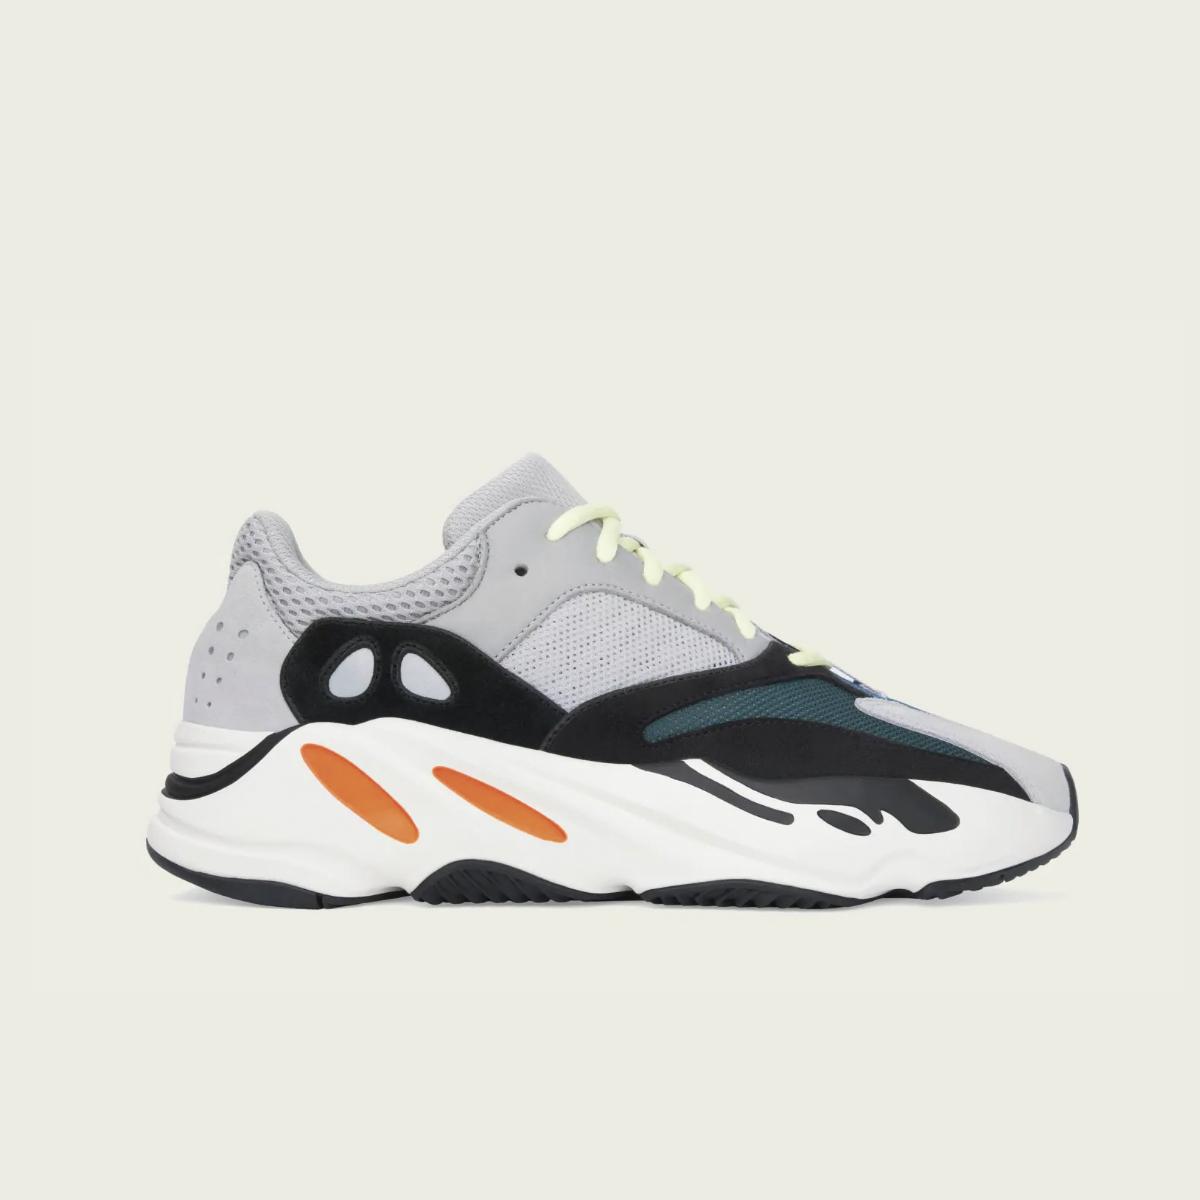 Adidas Yeezy Boost 700 (B75571)